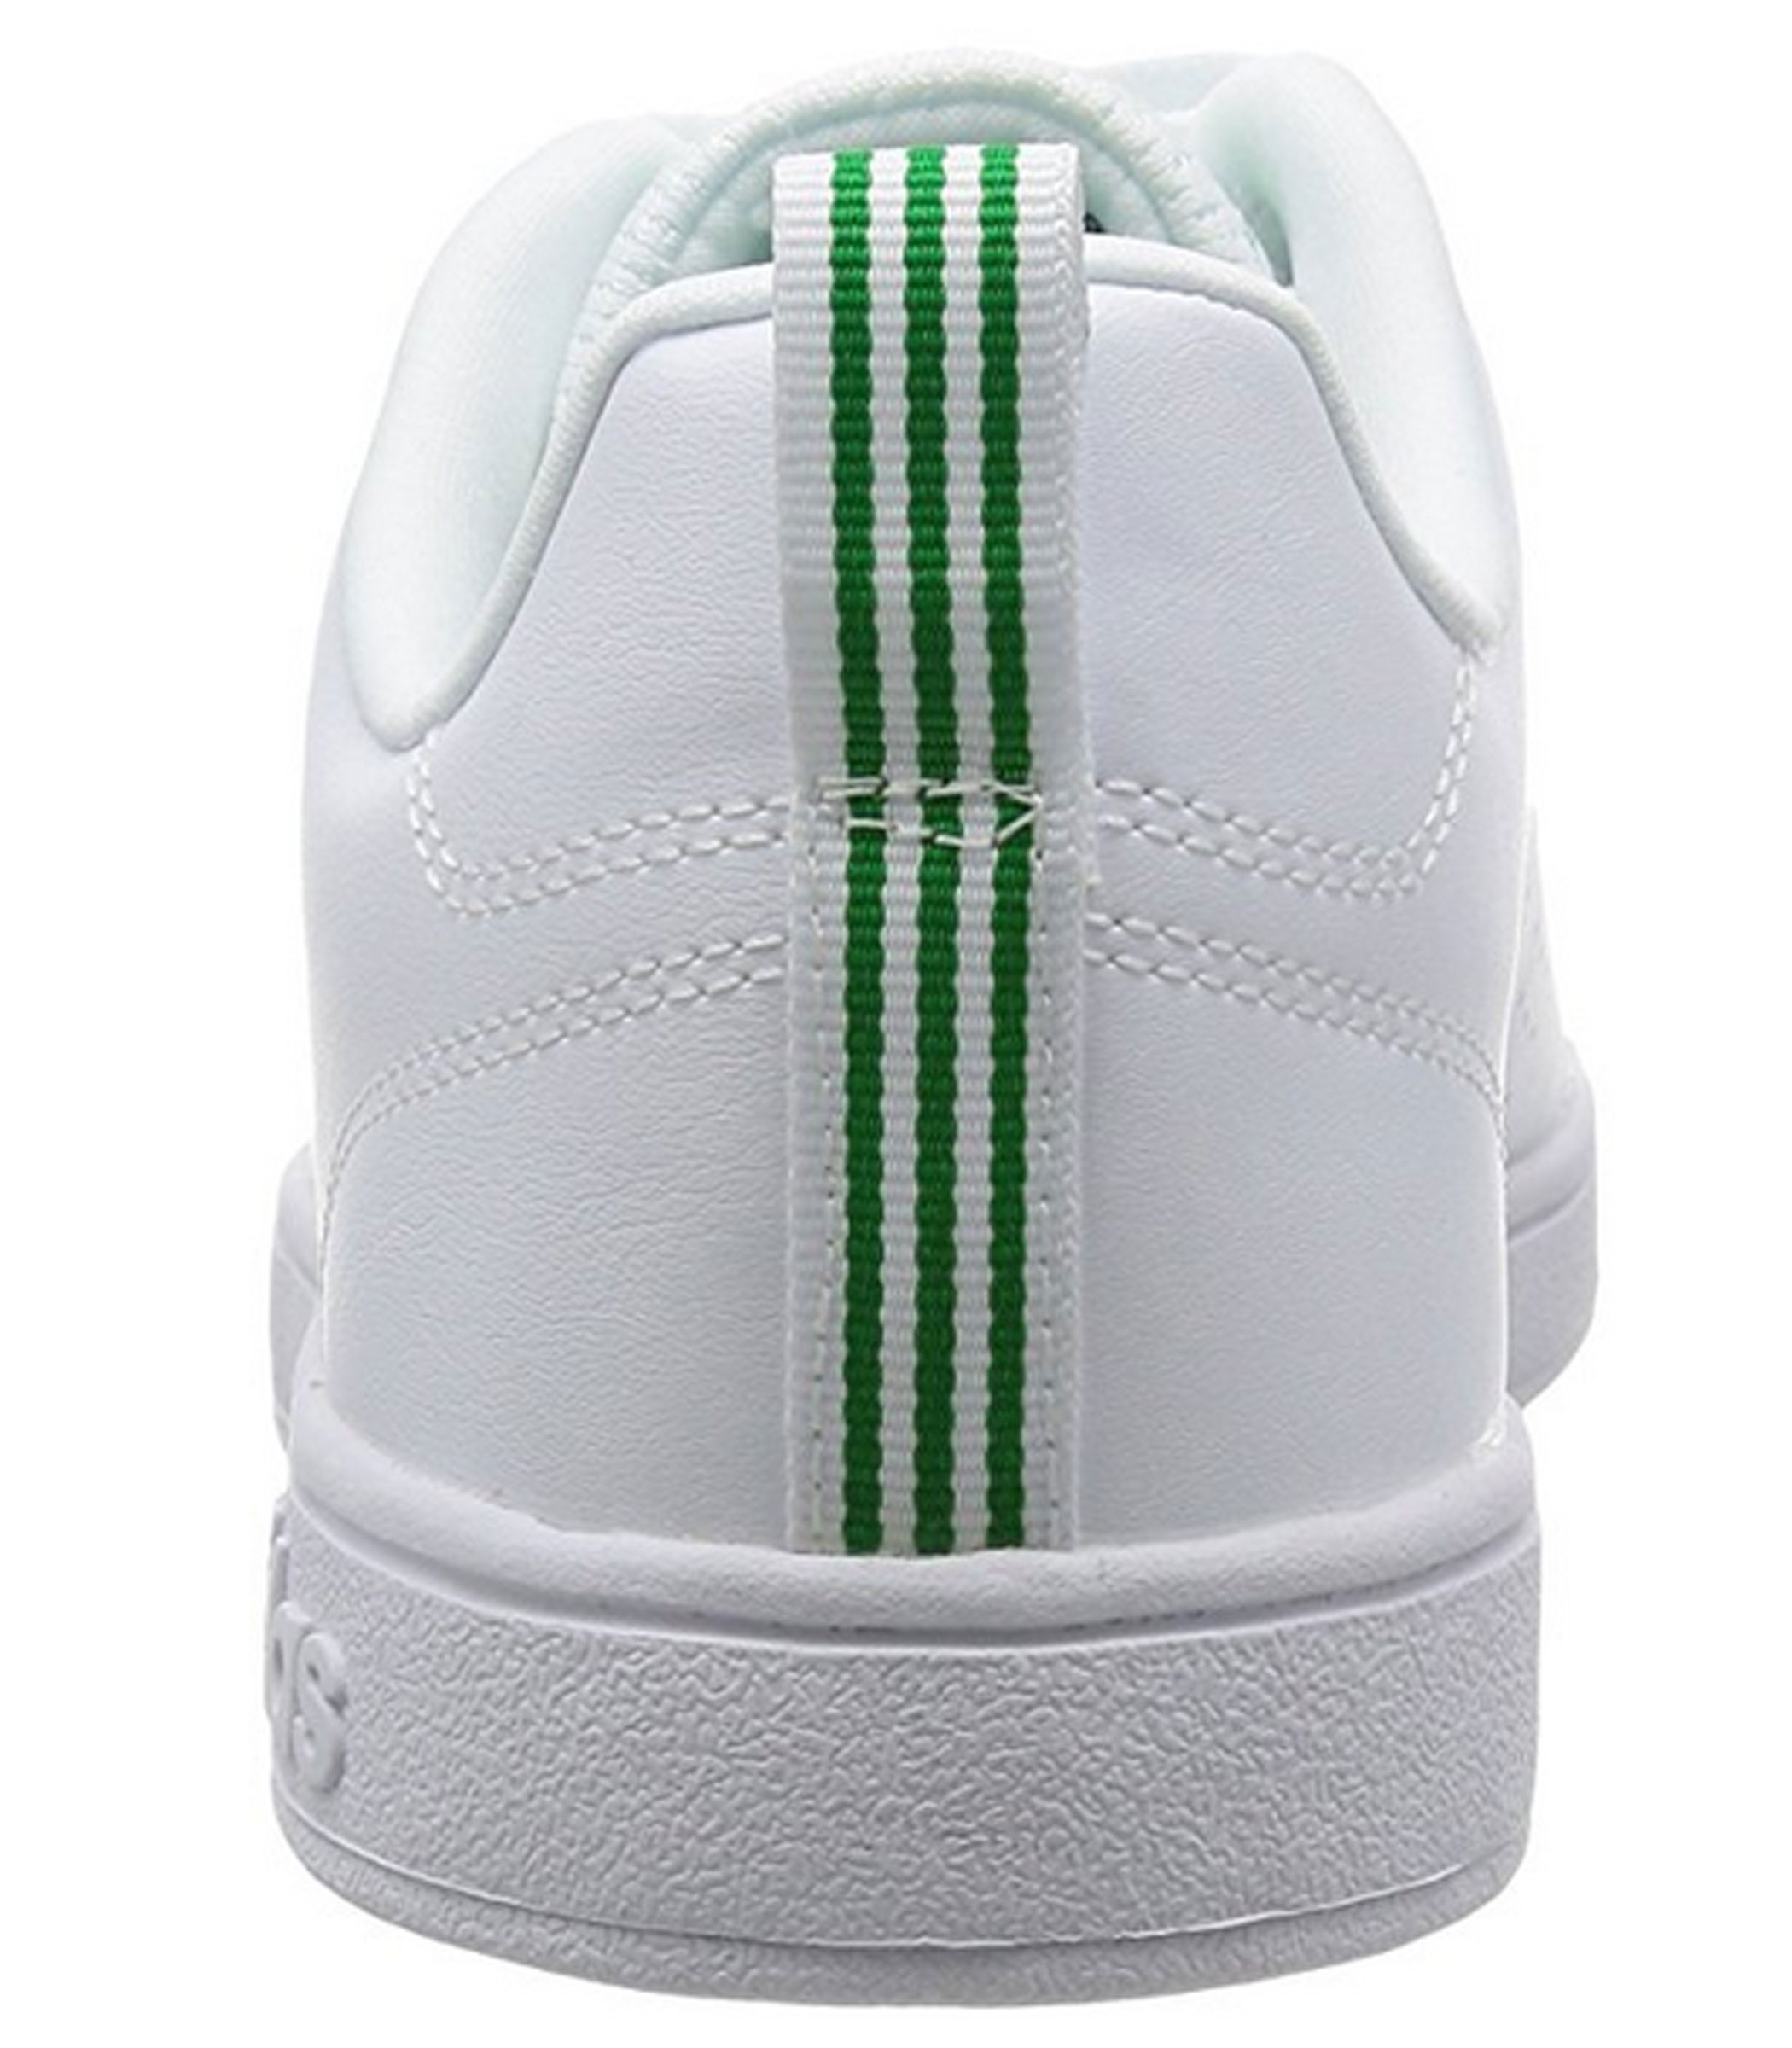 buy popular 30e6f be396 Scarpe Rif Advantage Vs Cl Uomo Neo F99251 Sportive Adidas ATB4H